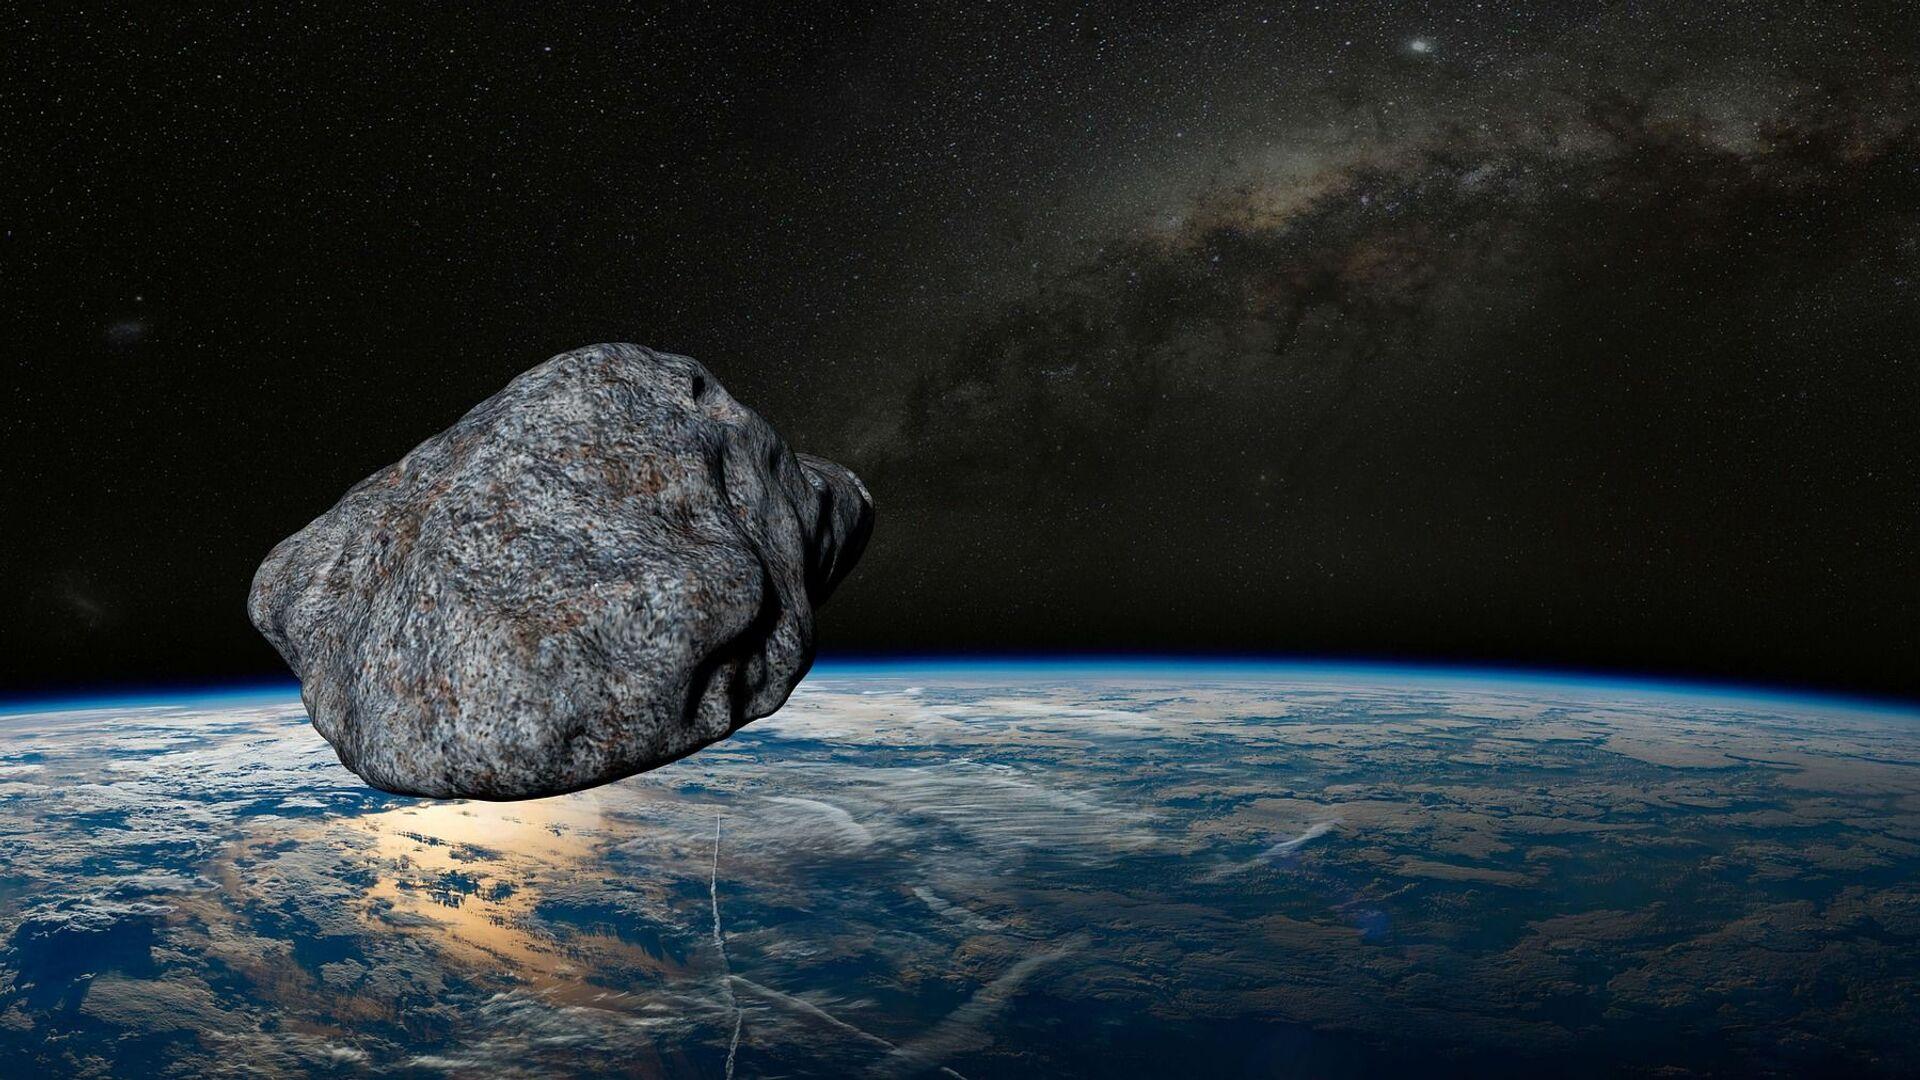 Un asteroide vola verso la Terra - Sputnik Italia, 1920, 15.06.2021